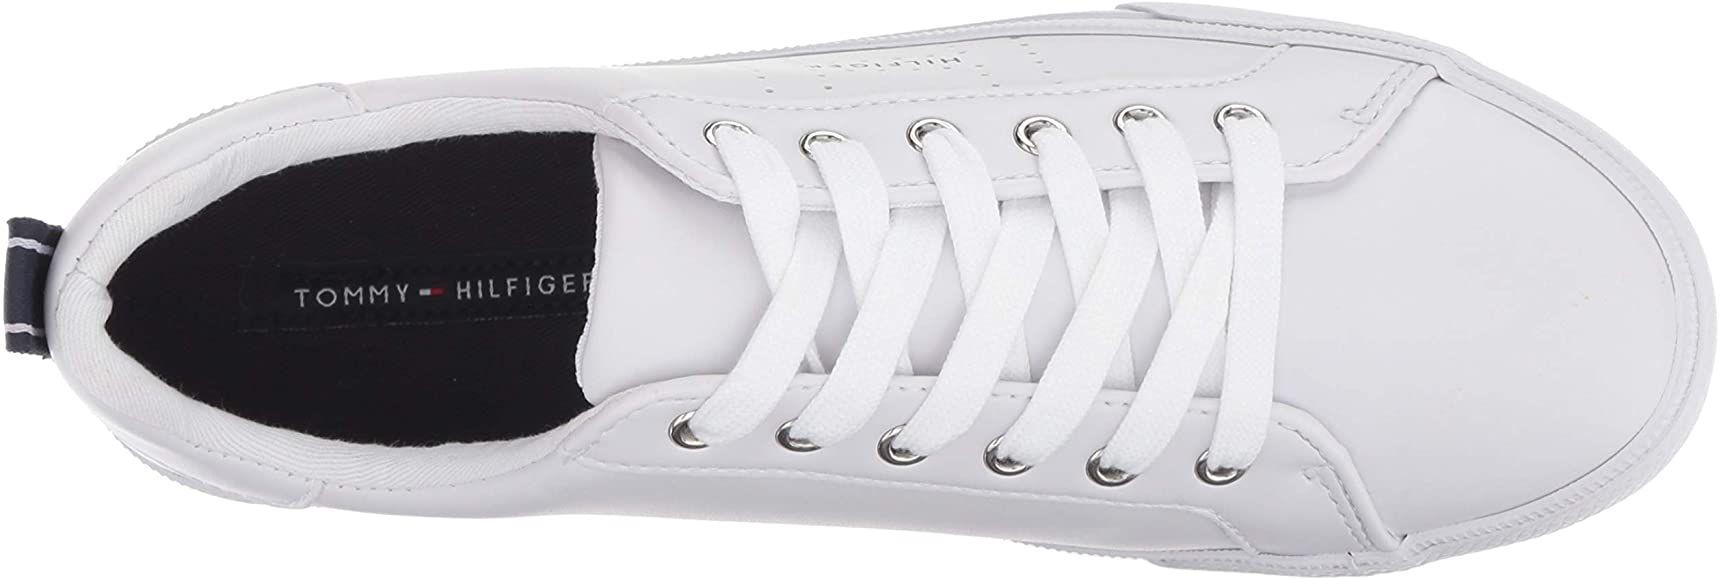 Tommy Hilfiger Lelita Zapatillas Para Mujer Blanco 7 5 Shoes In 2020 Tommy Hilfiger Women Tommy Hilfiger Sneakers